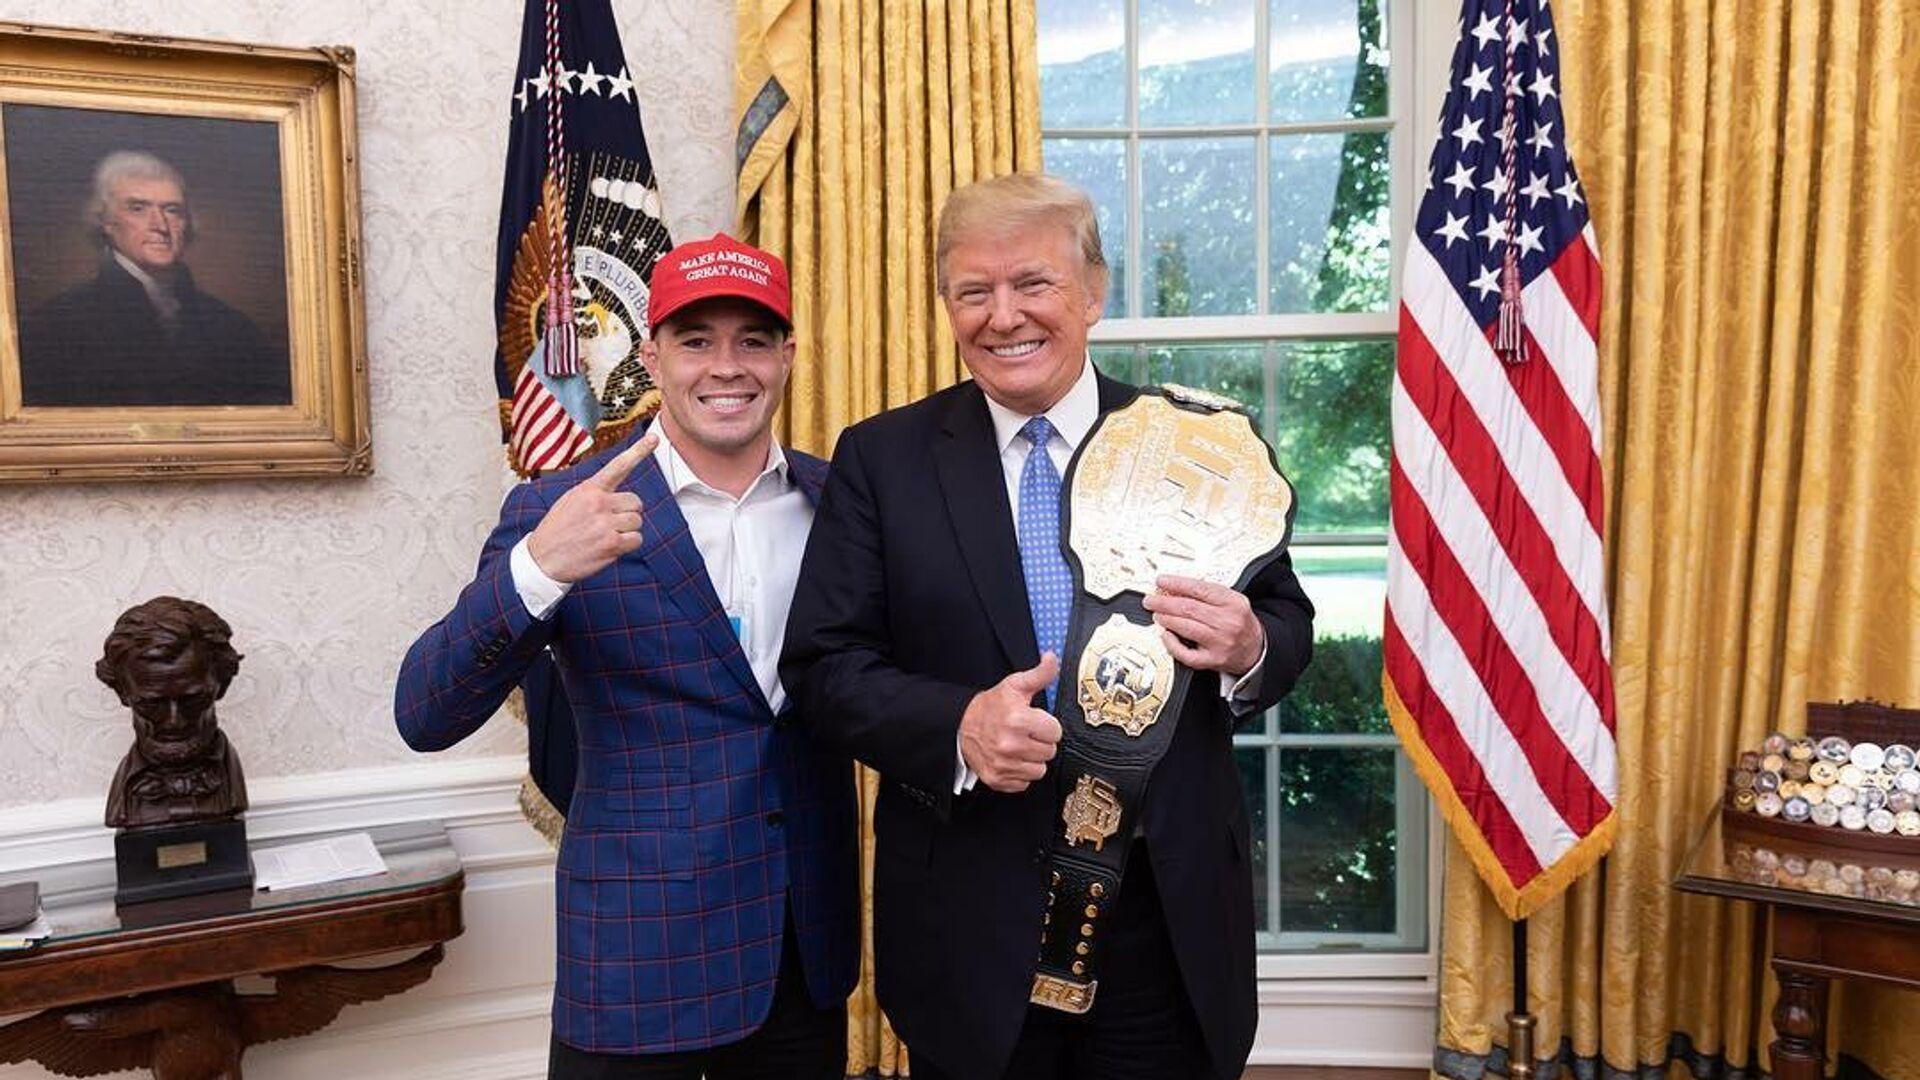 Боец MMA Колби Ковингтон (слева) и президент США Дональд Трамп - РИА Новости, 1920, 18.09.2020